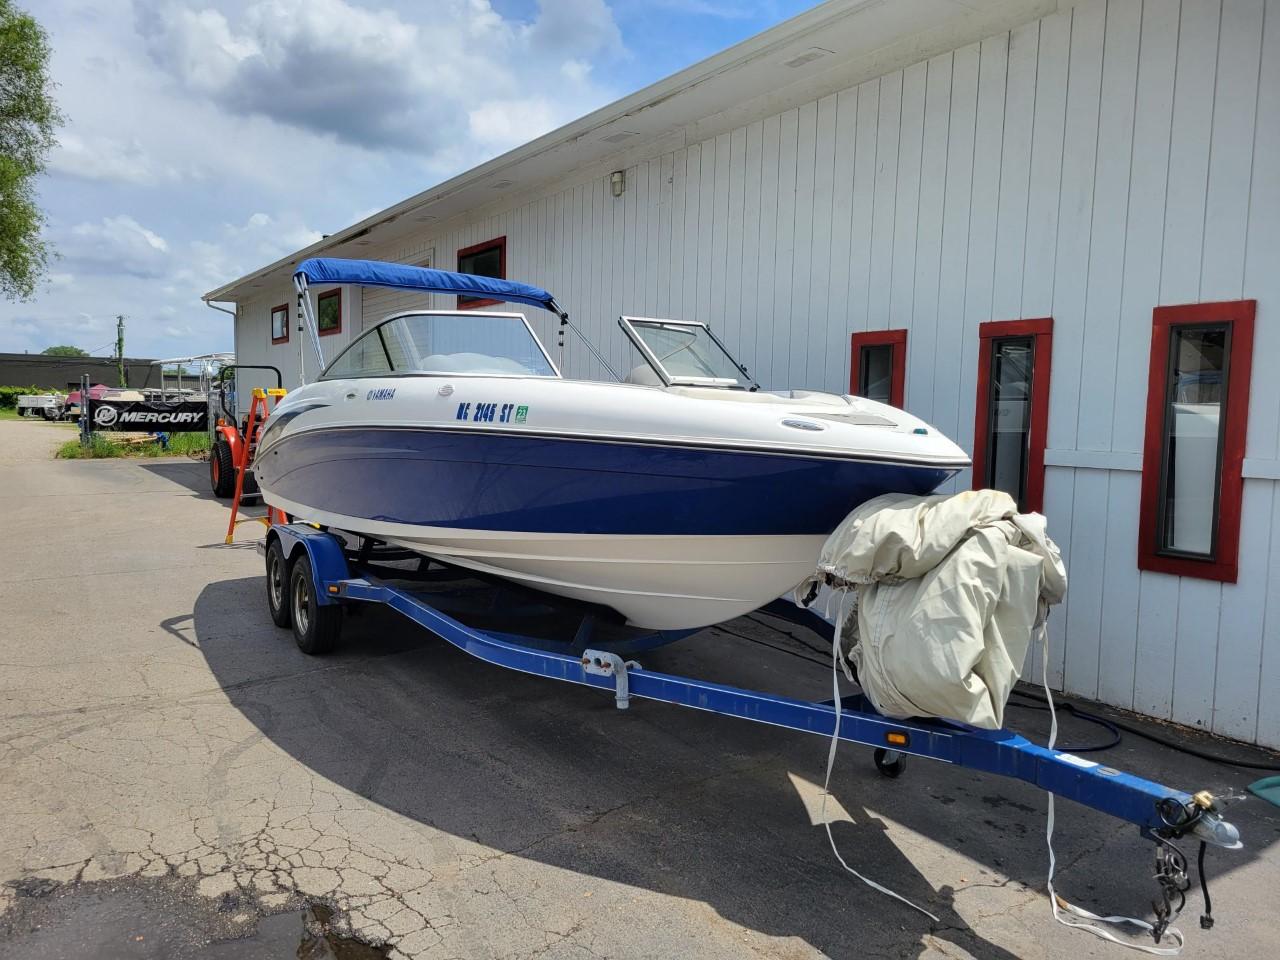 2005 Yamaha SX 230 Twin Engine Jet Boat